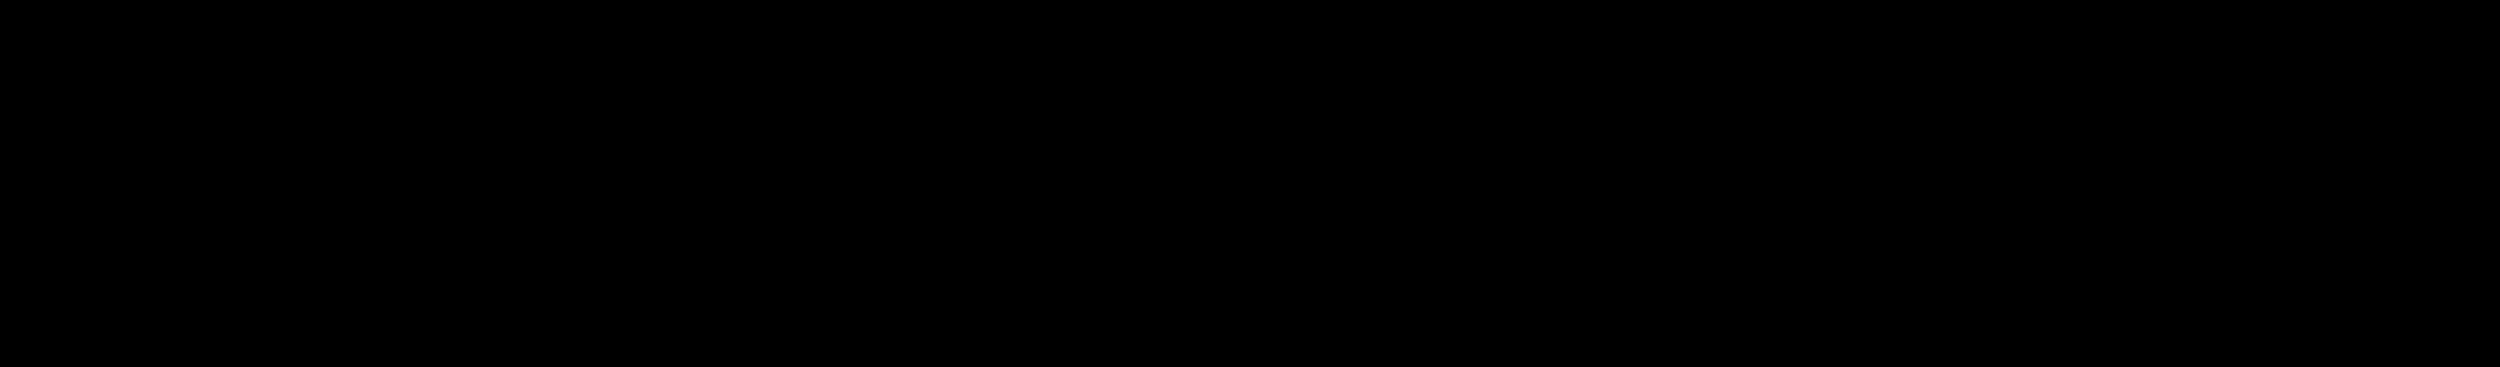 mm+logo+large.png